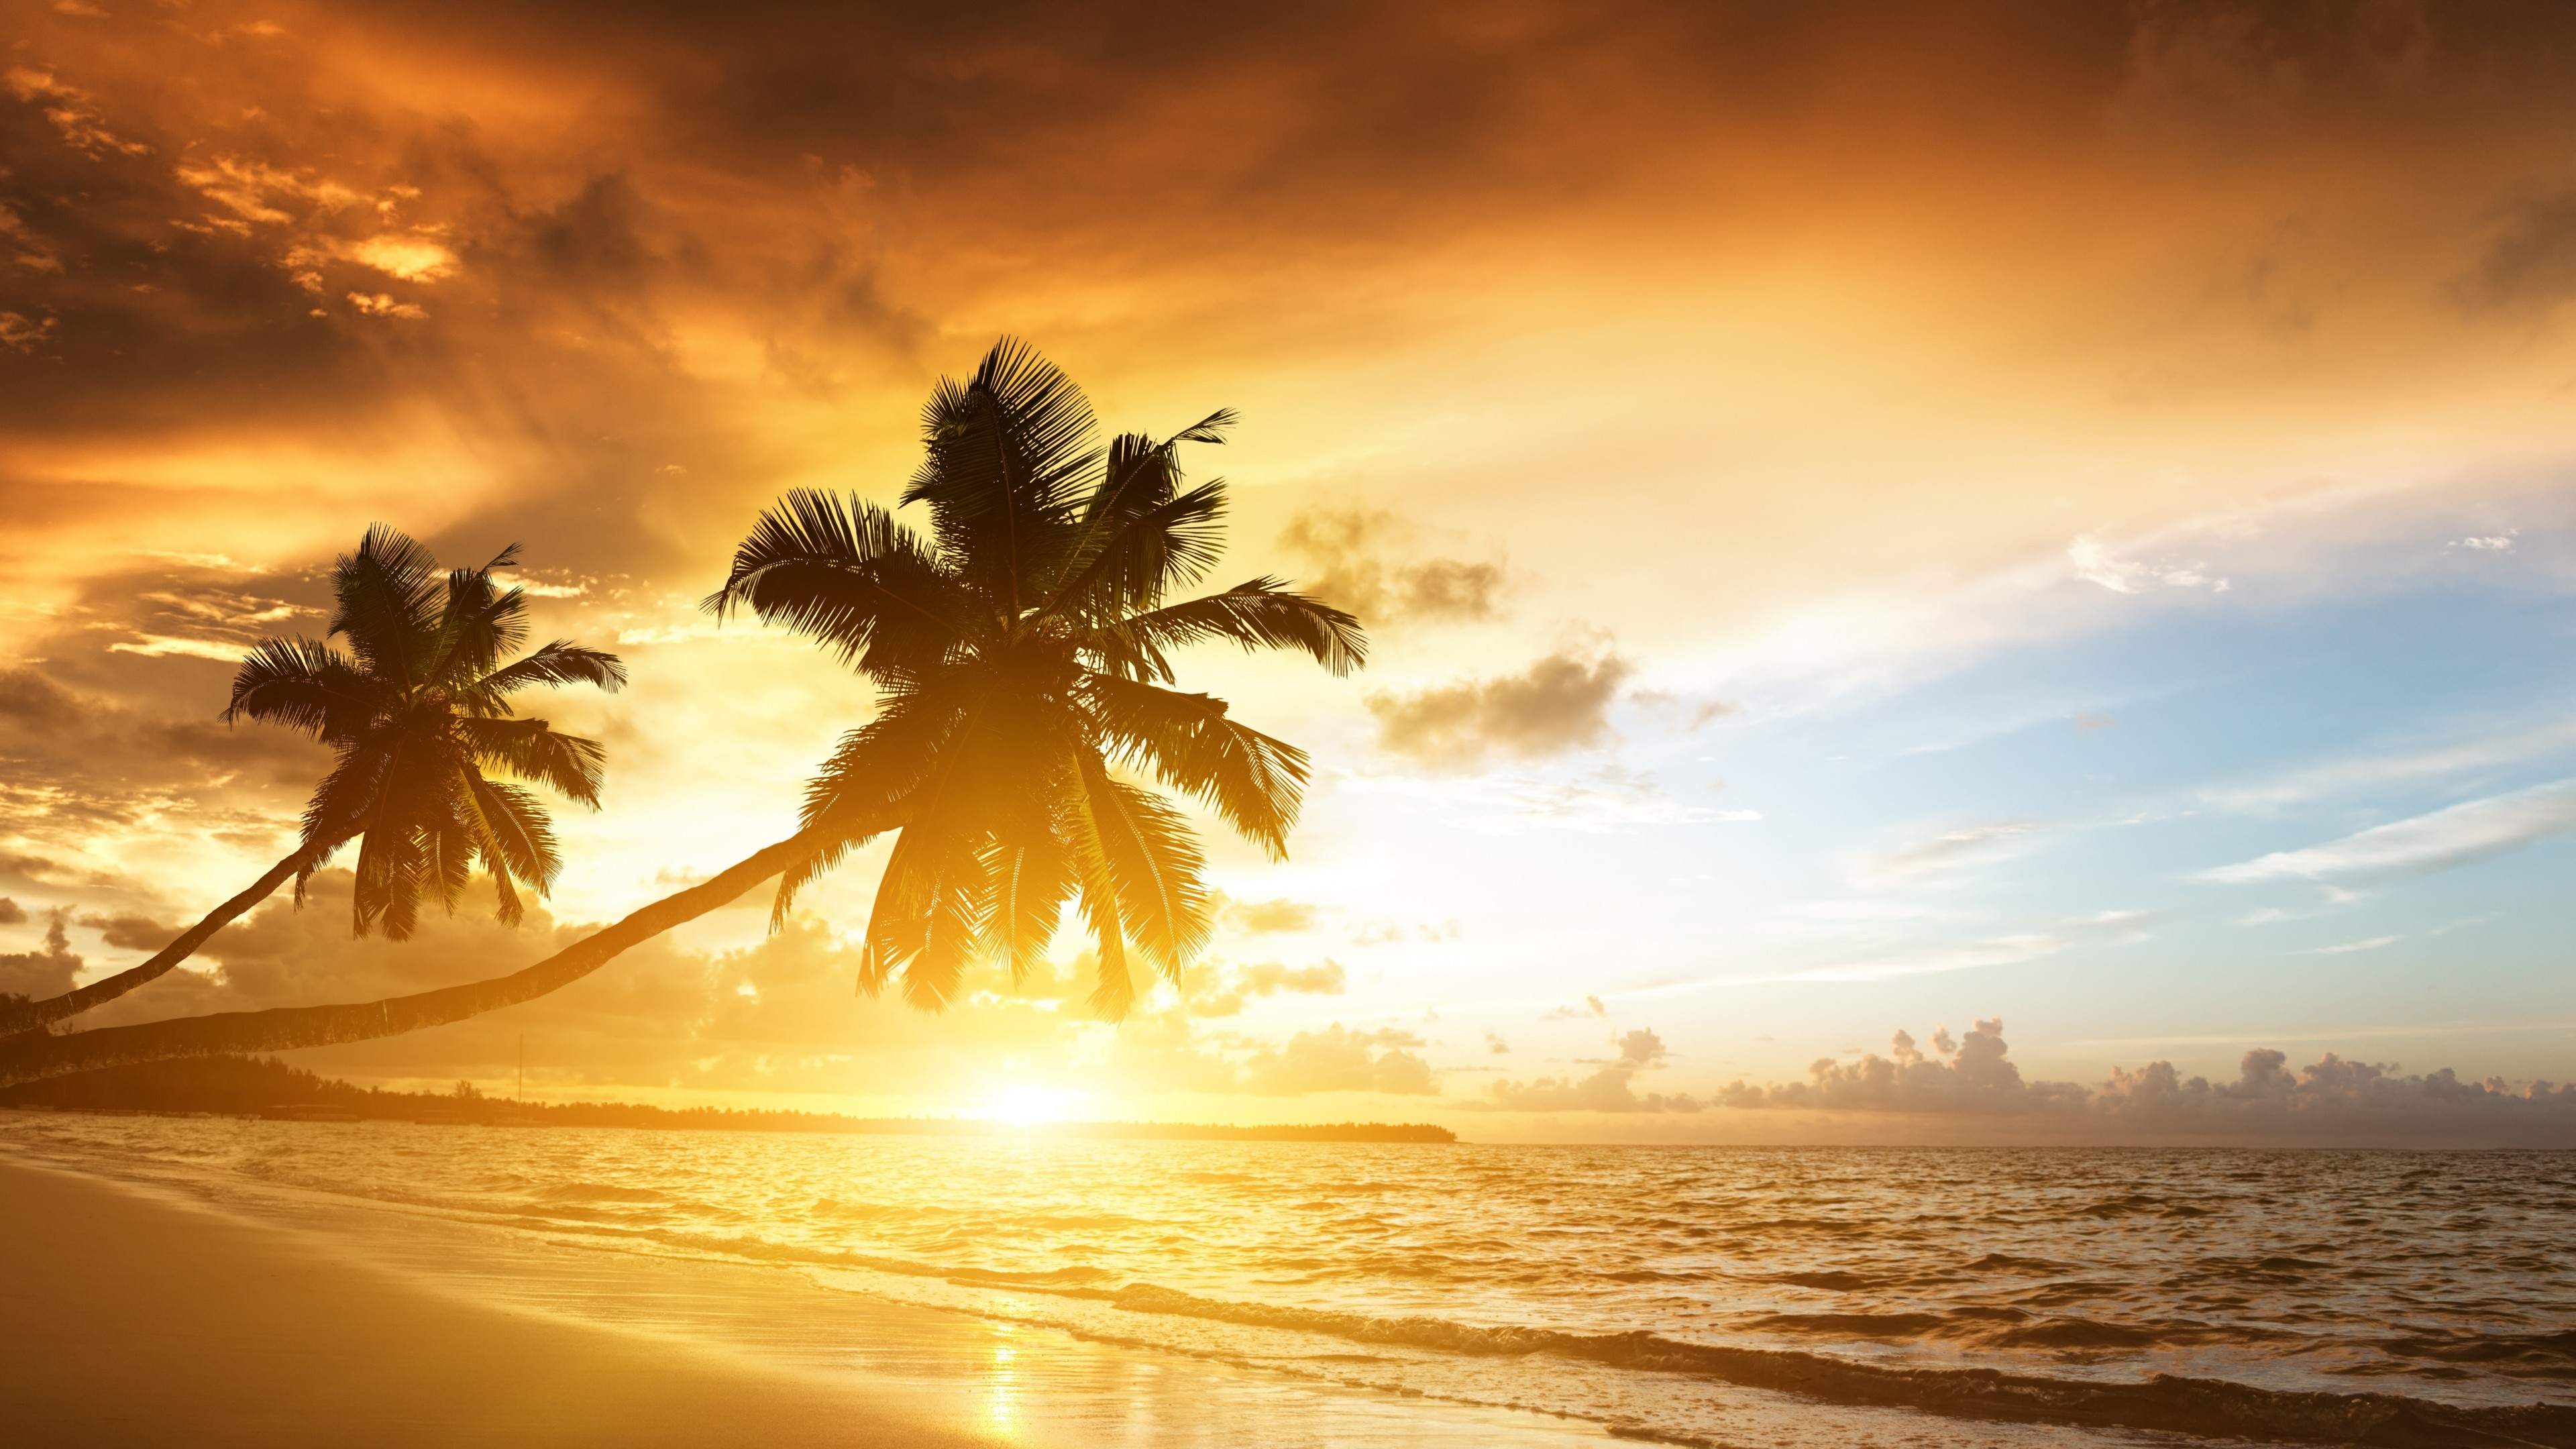 Preview wallpaper beach, tropics, sea, sand, palm trees, sunset, evening